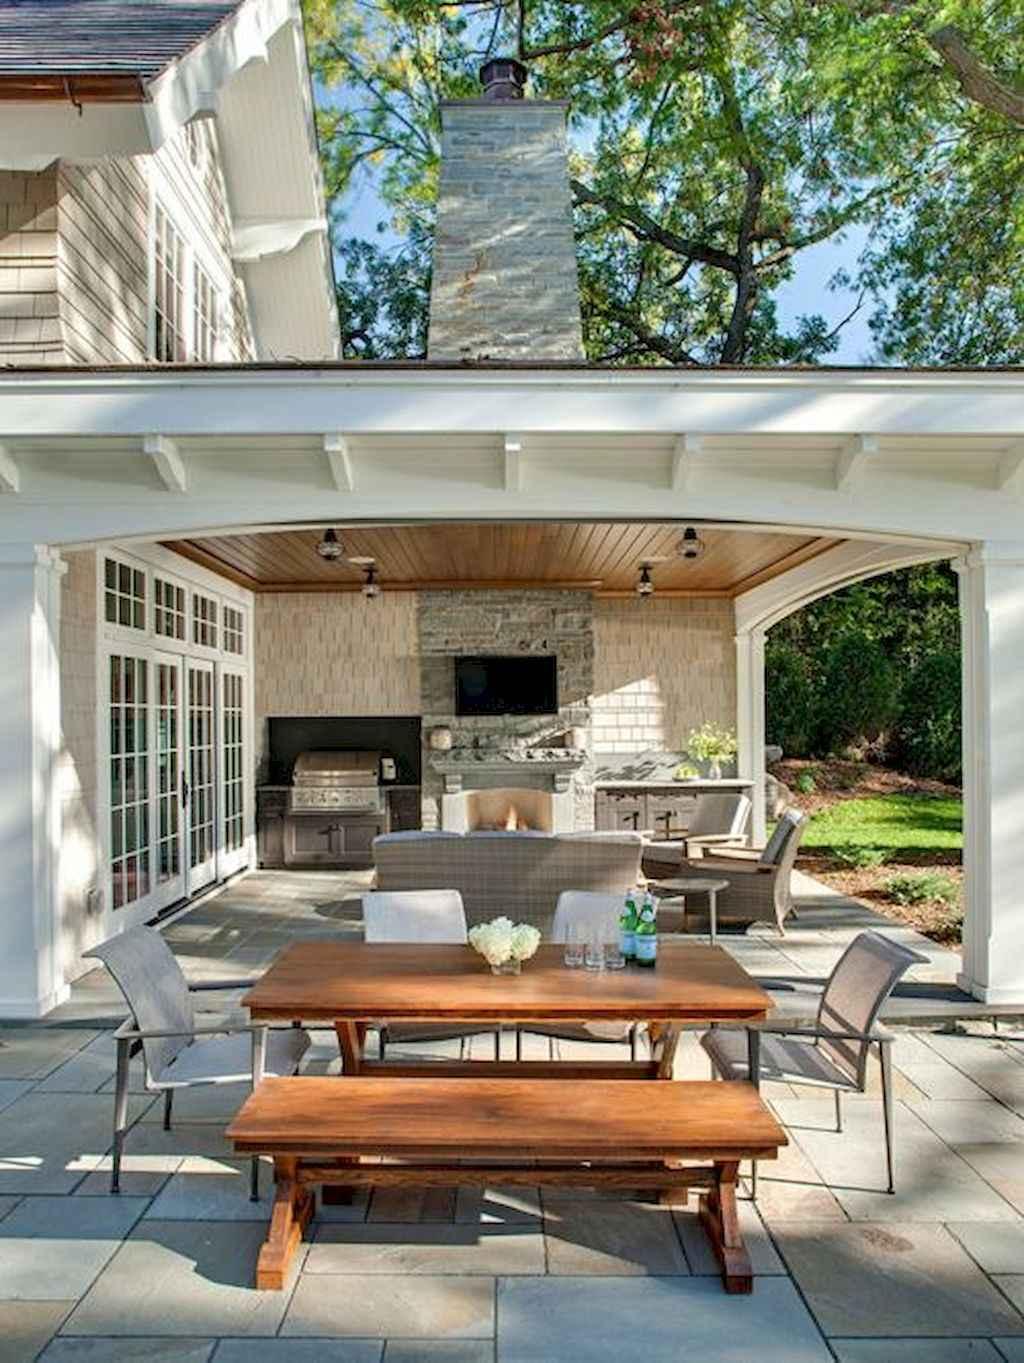 Top 25 Stunning Backyard Patio Design Ideas (3)